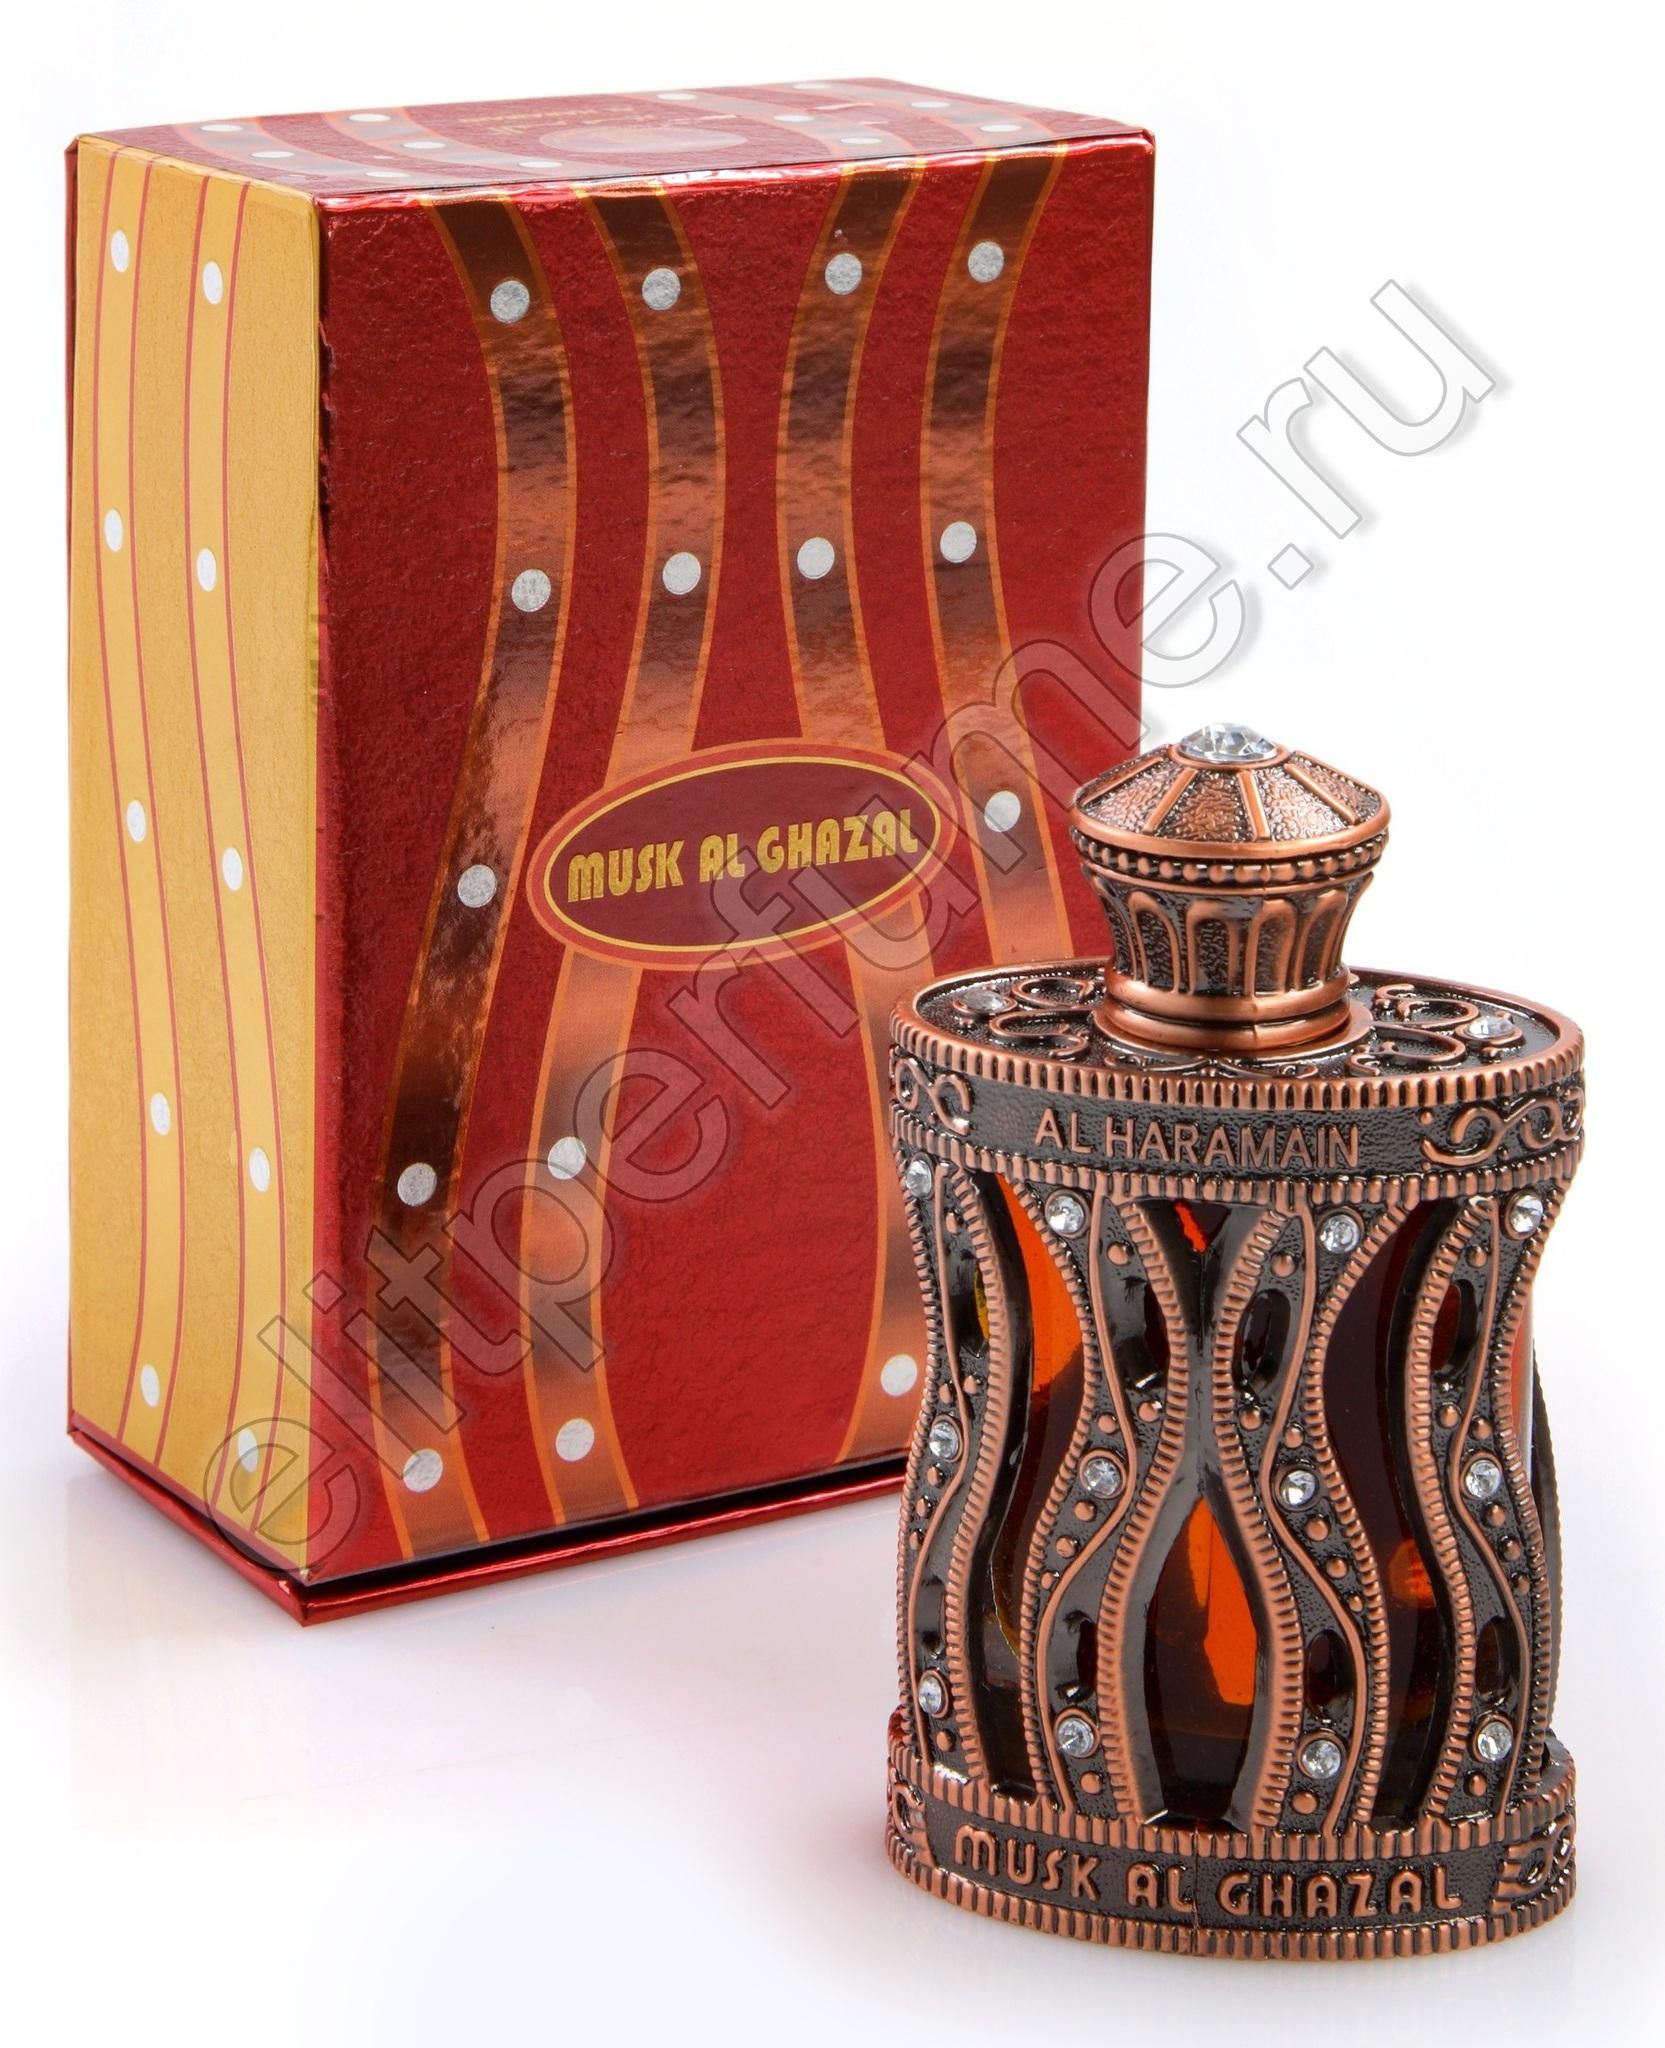 Пробники для духов Мускус Аль-Газаль Musk Al Ghazal 1 мл арабские масляные духи от Аль Харамайн Al Haramin Perfumes